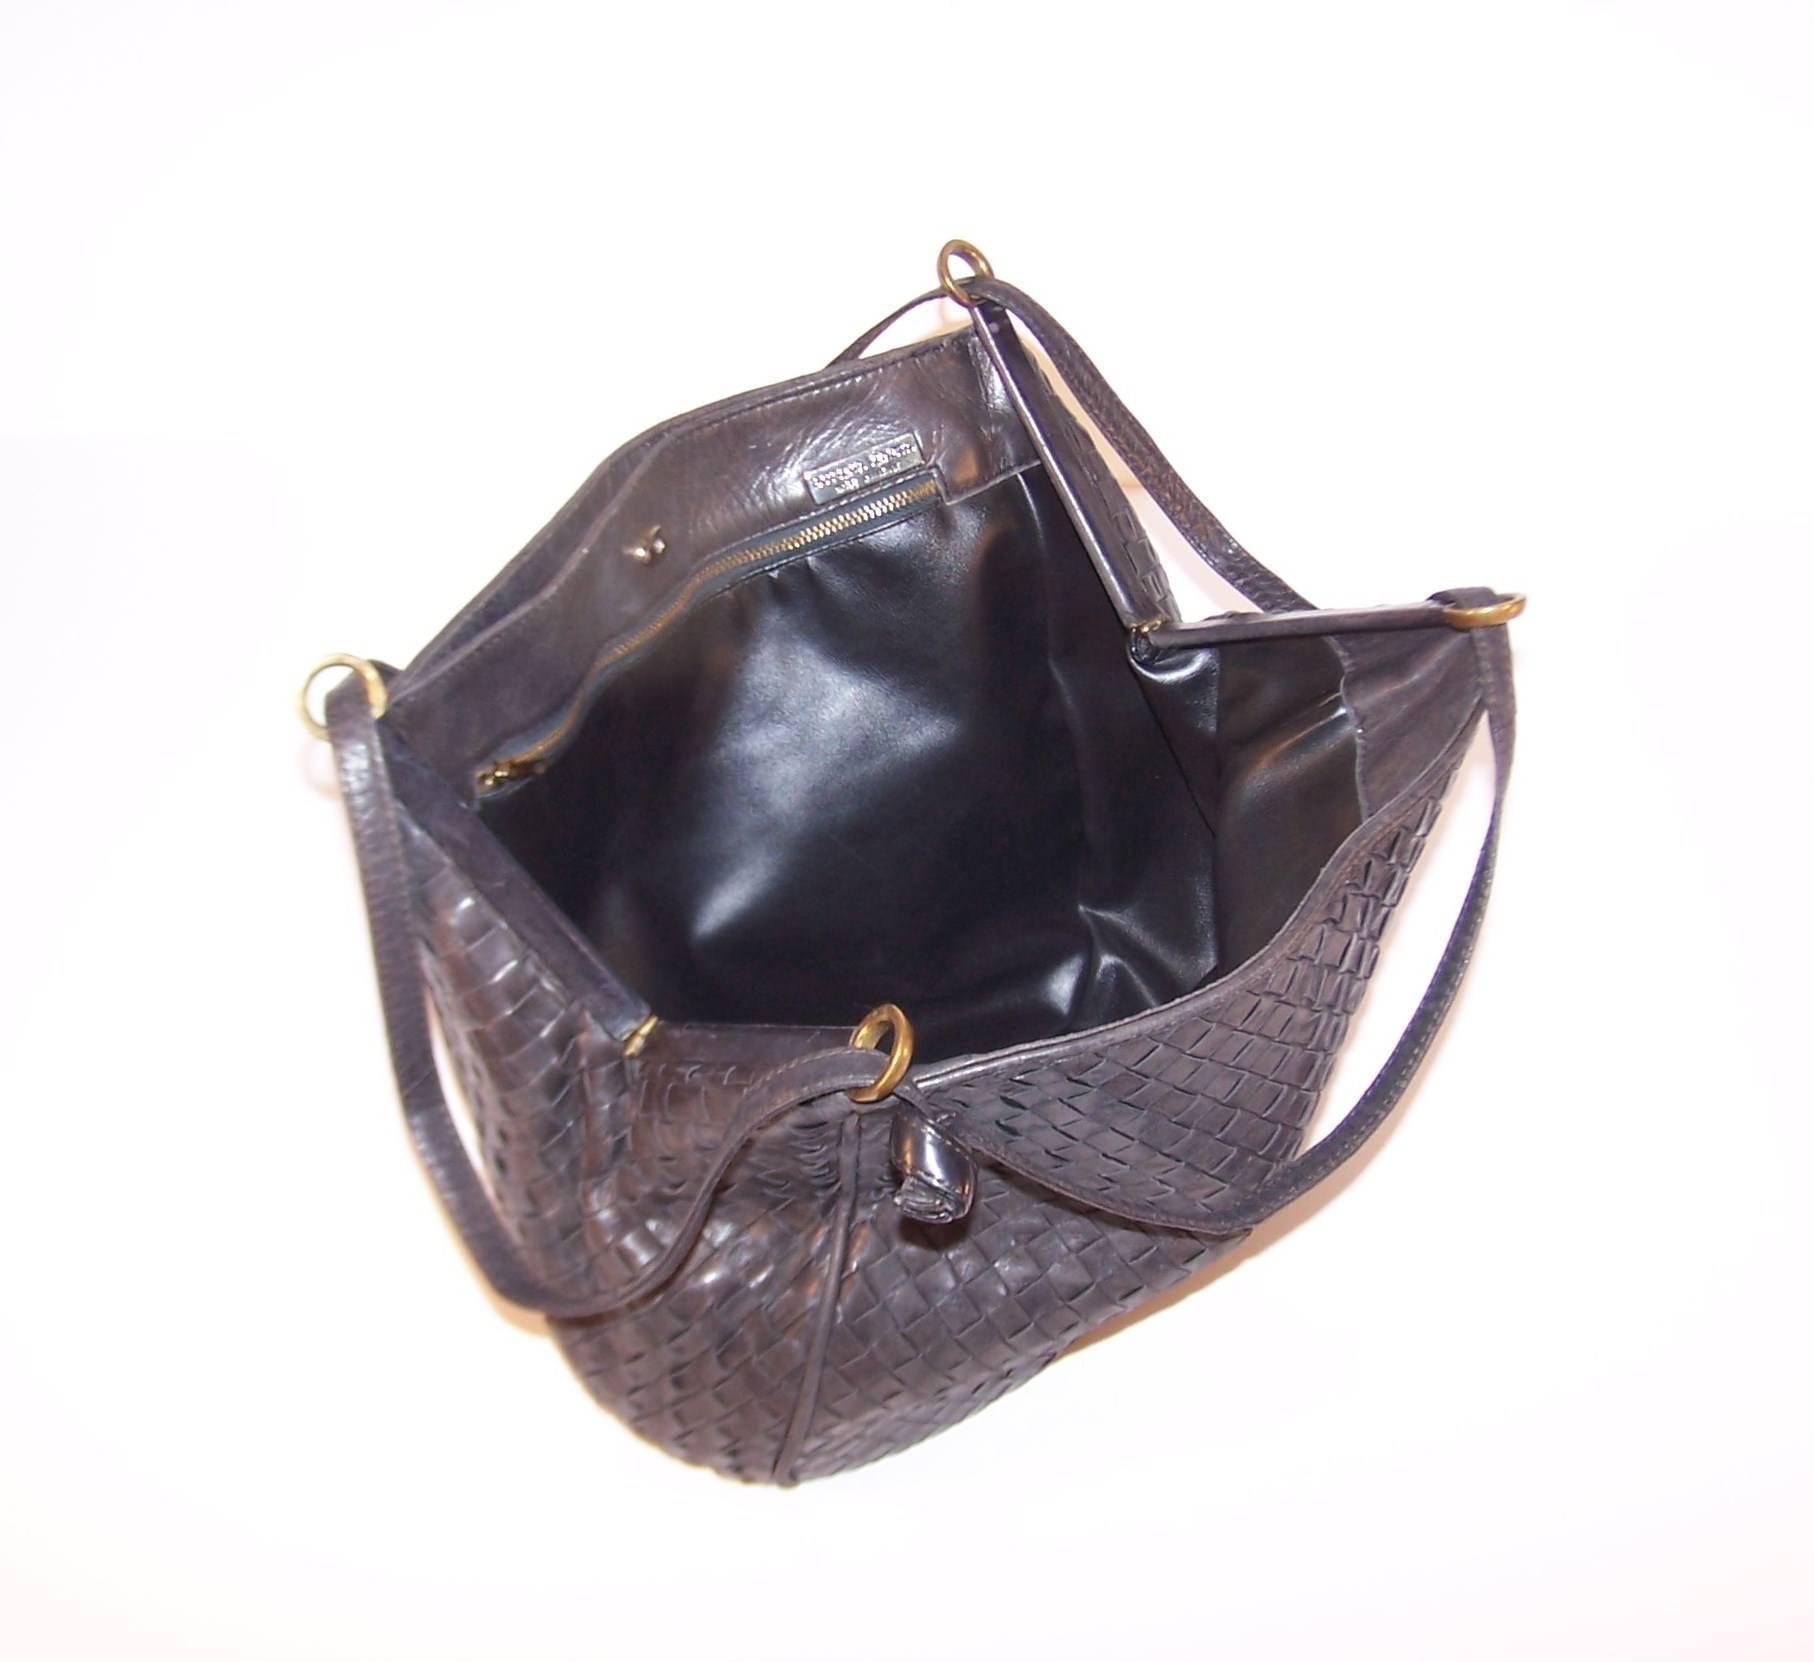 Vintage Bottega Veneta Charcoal Gray Intrecciato Leather Shoulder Handbag  at 1stdibs 73c1932b401f6